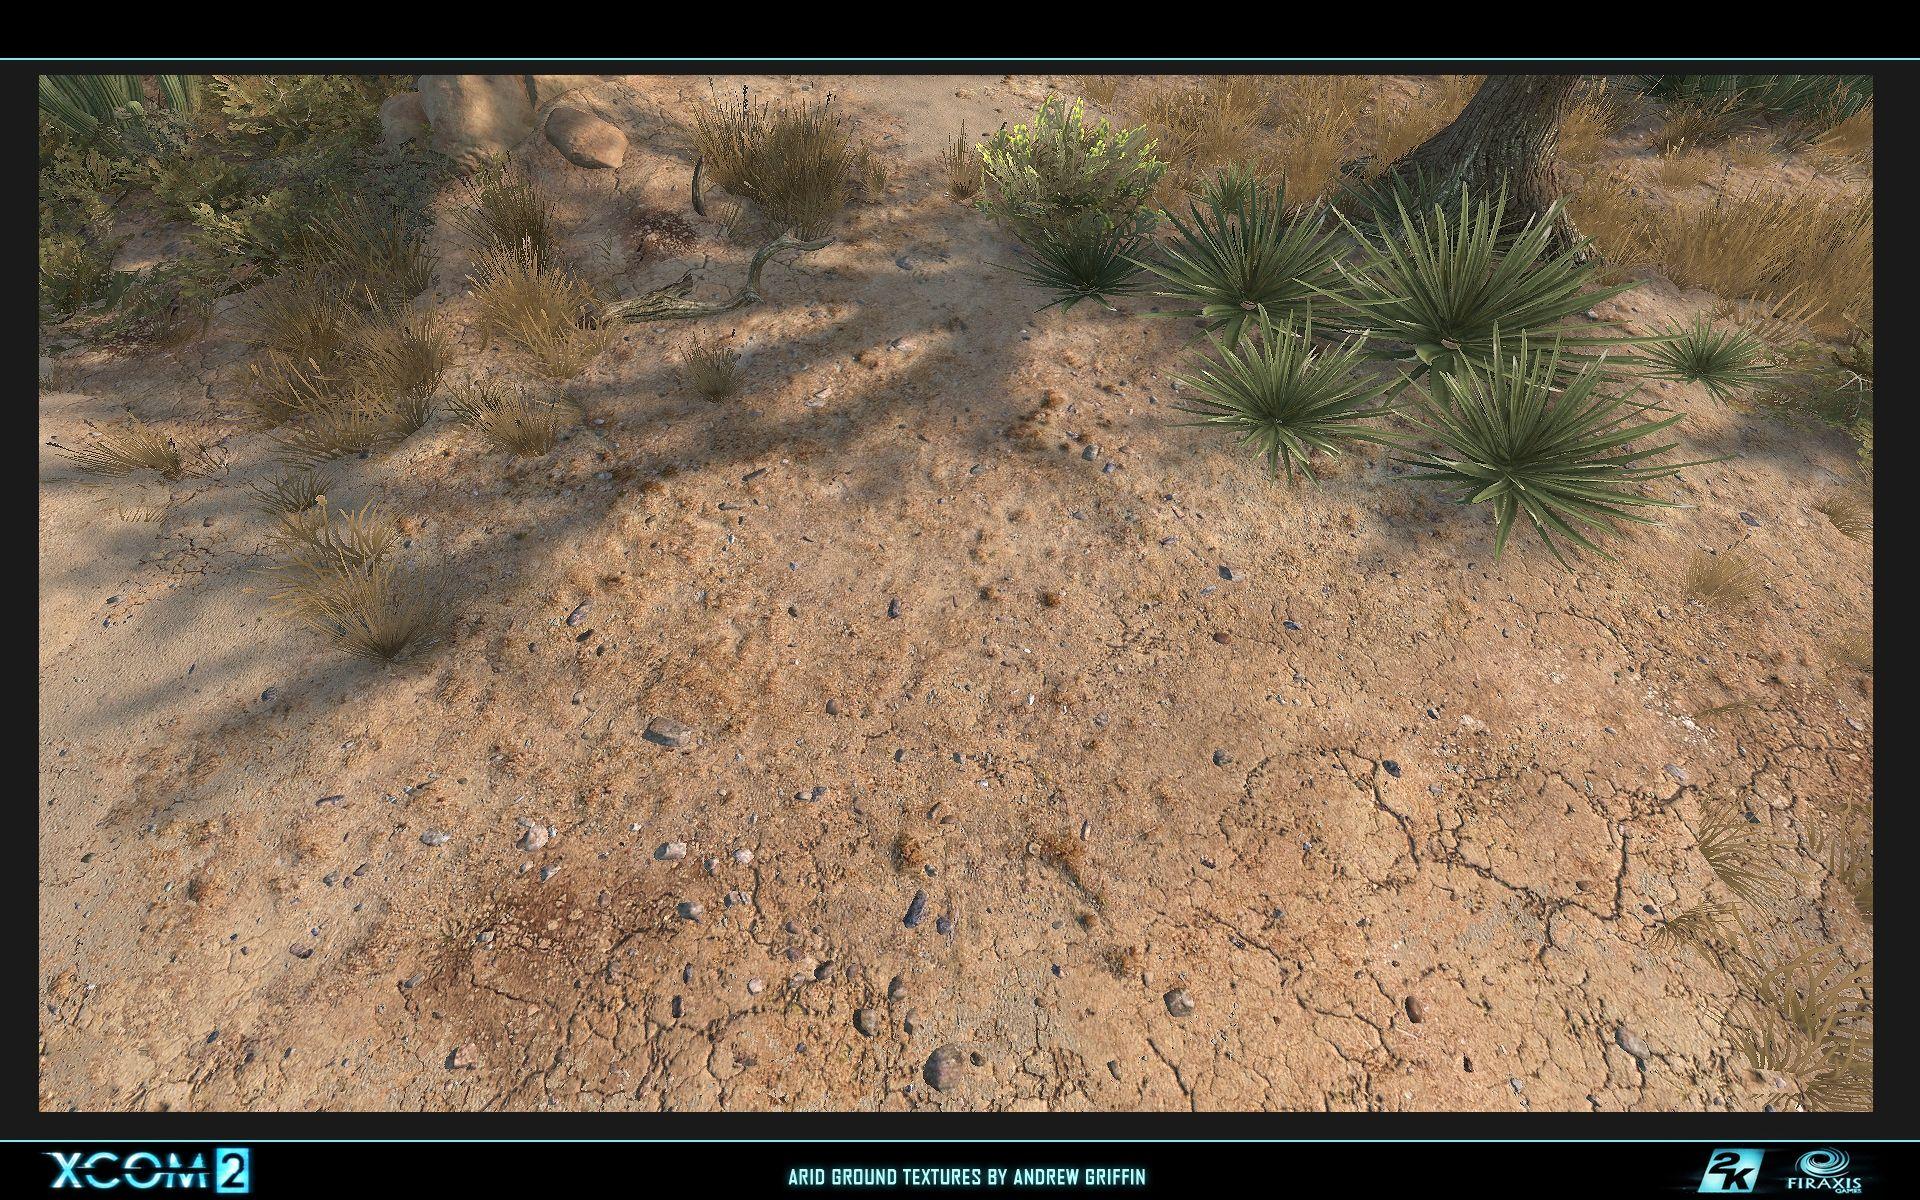 XCOM 2 Environment & Concept Art Dump - polycount